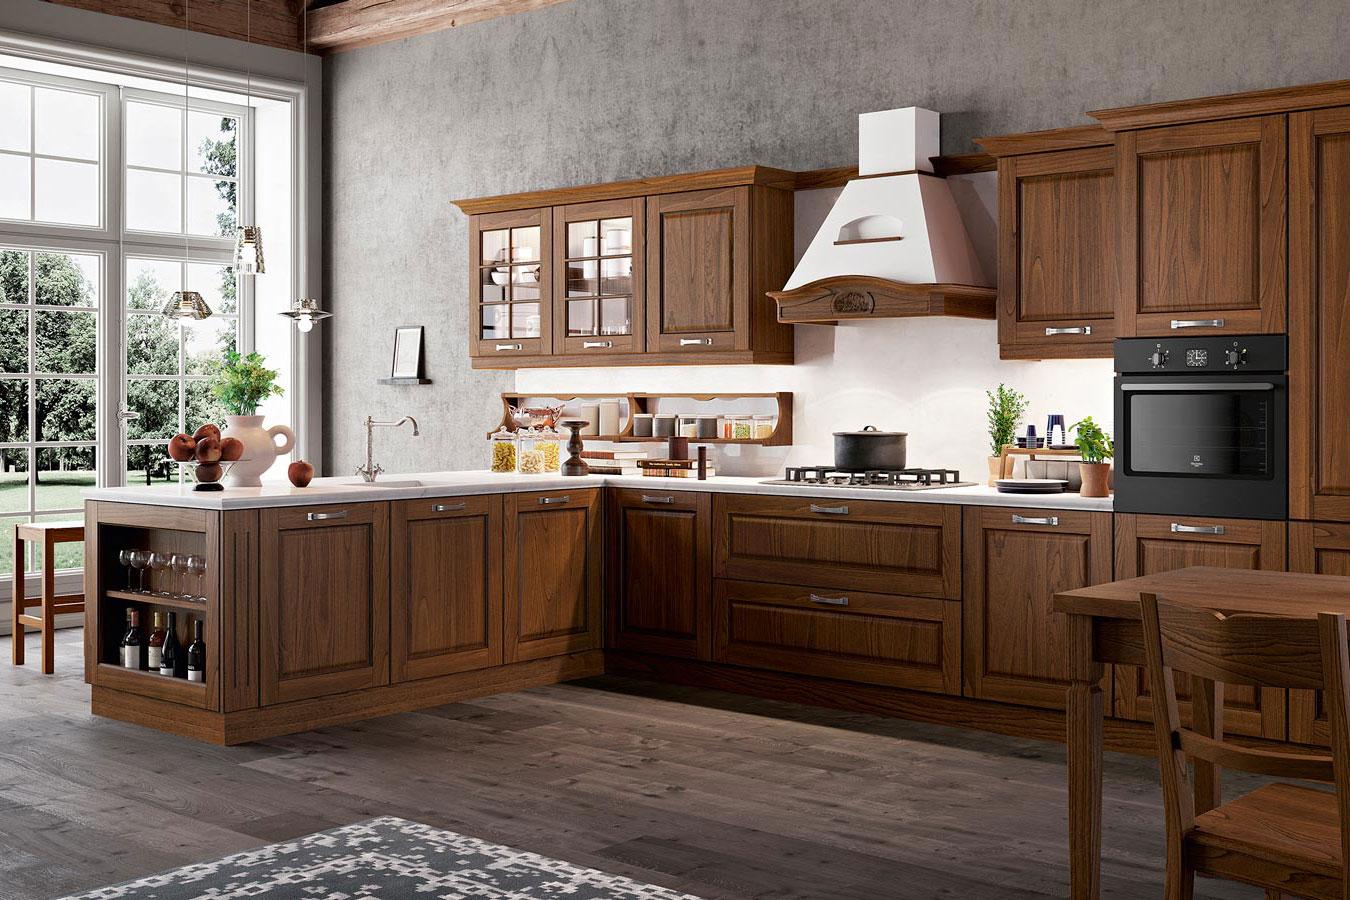 Arredo cucina classica interesting arcari arredamenti - Arredo cucina classica ...